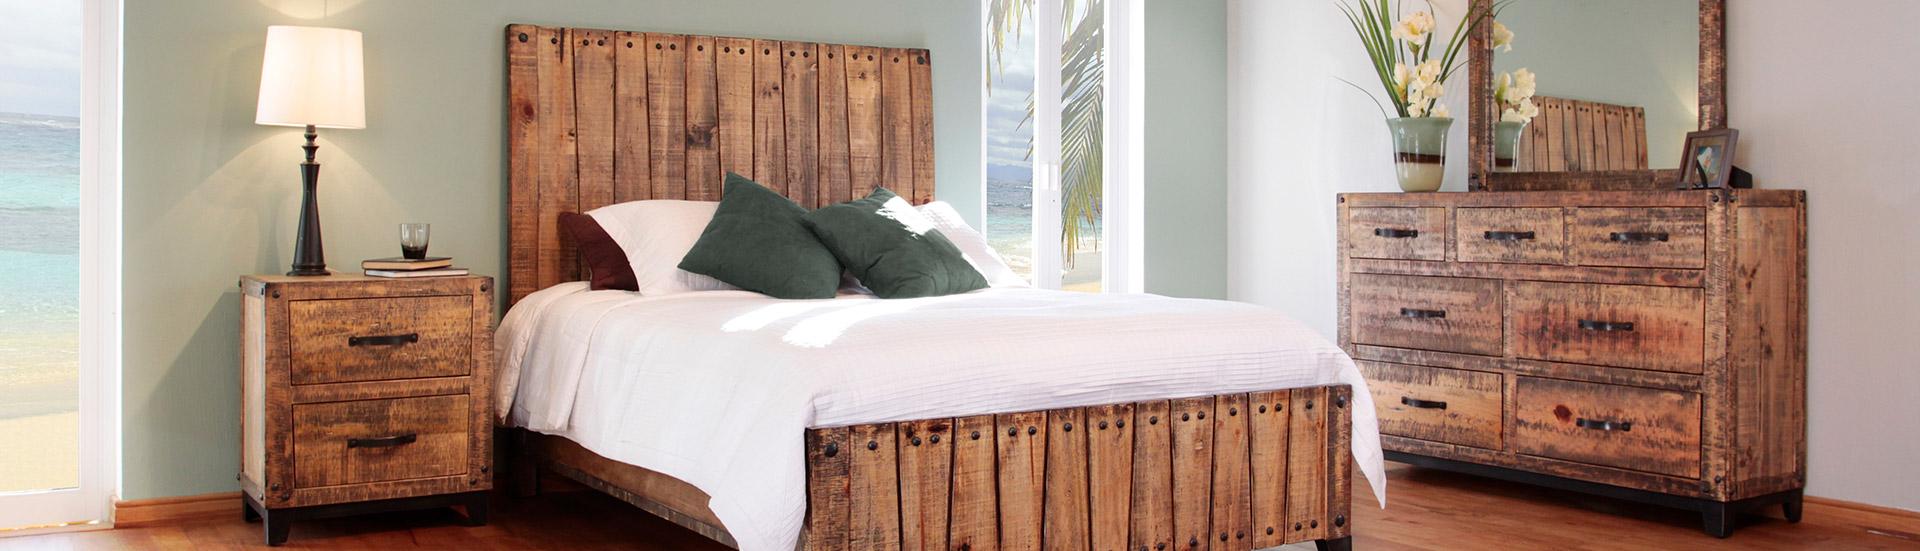 Bedroom Furniture In La Grande, OR